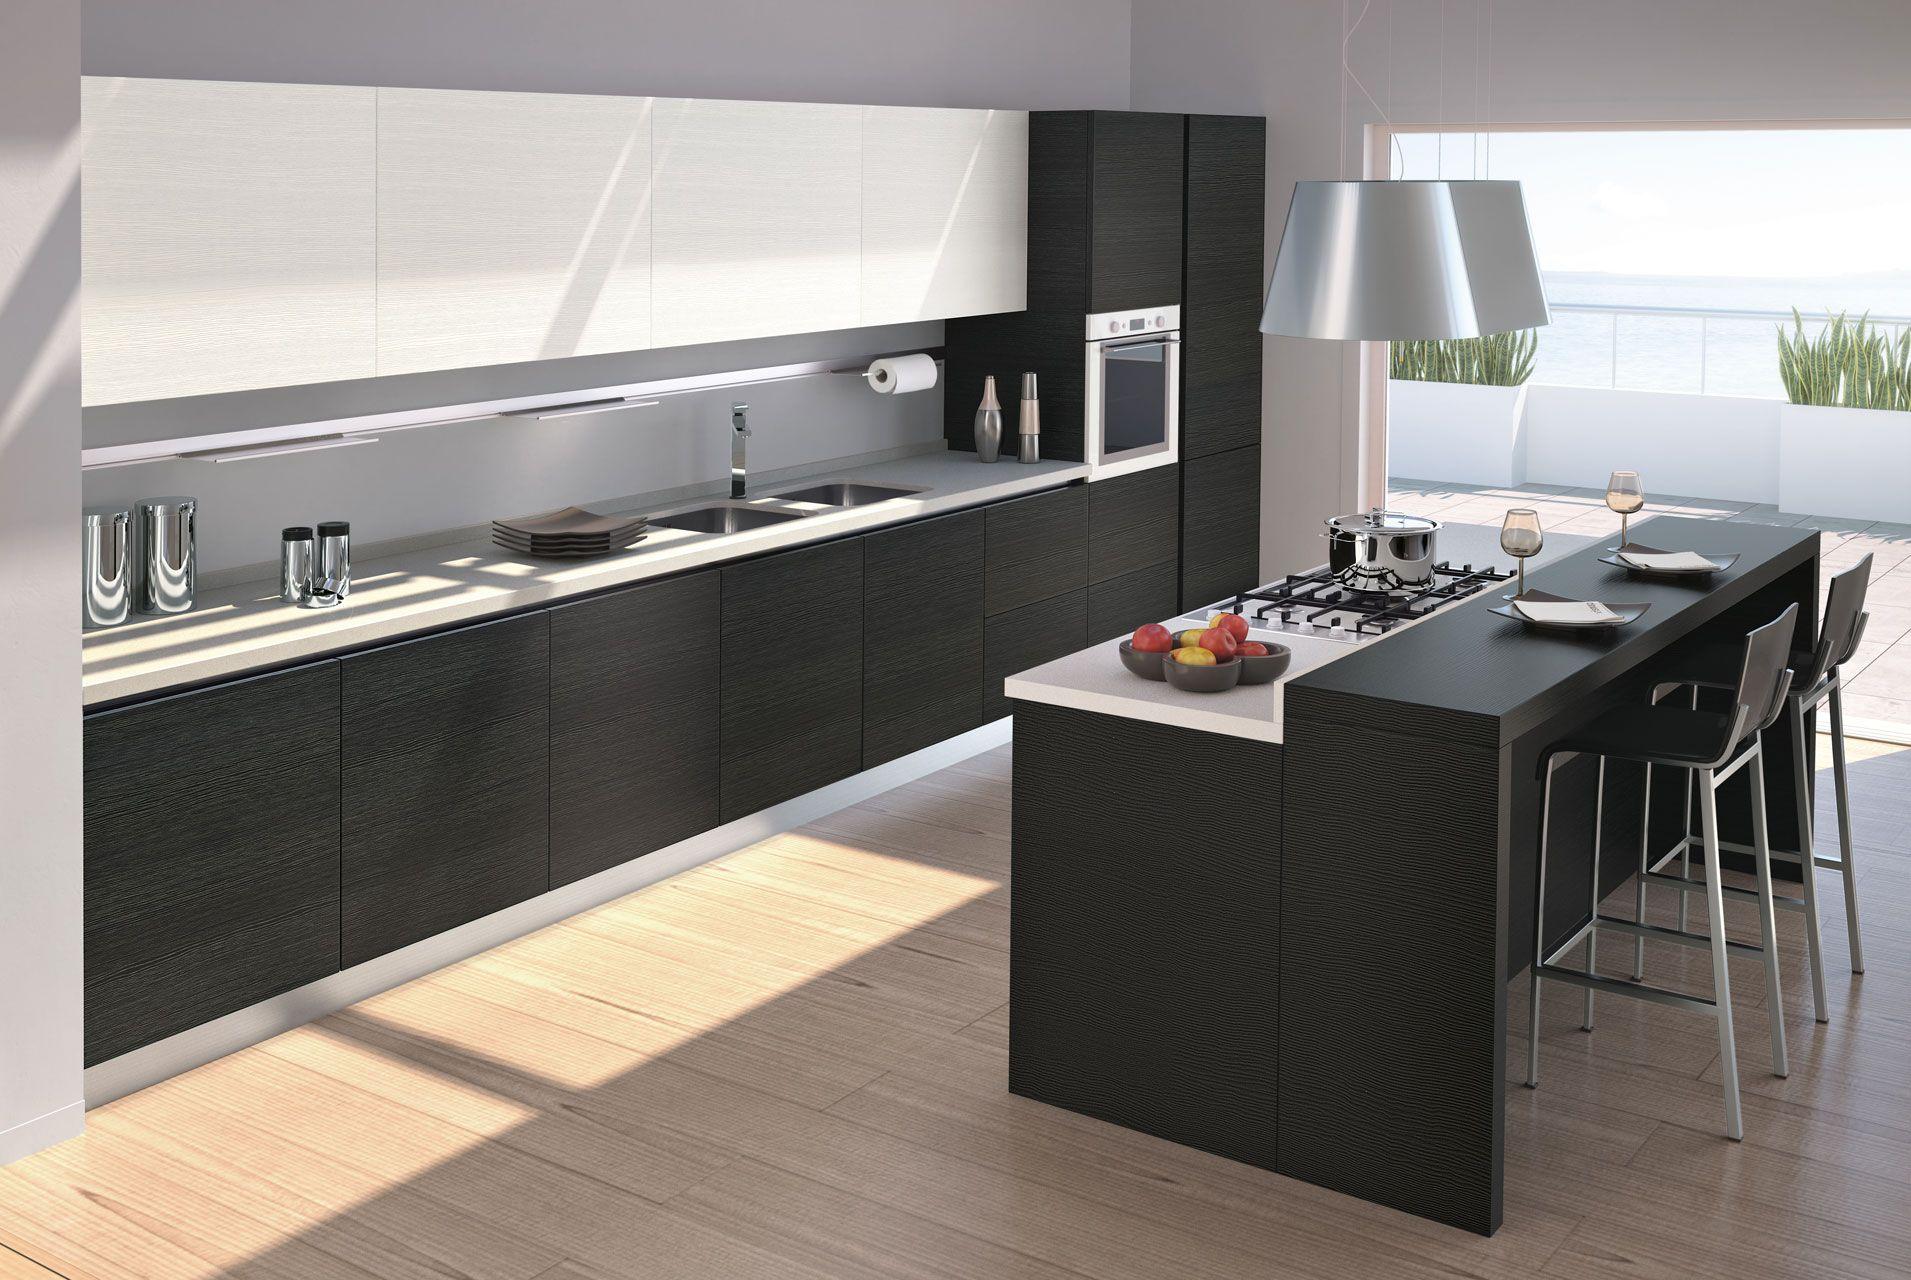 beautifully minimalistic kitchen vismap cucine moderno idea plus idea plus yellowpine 1